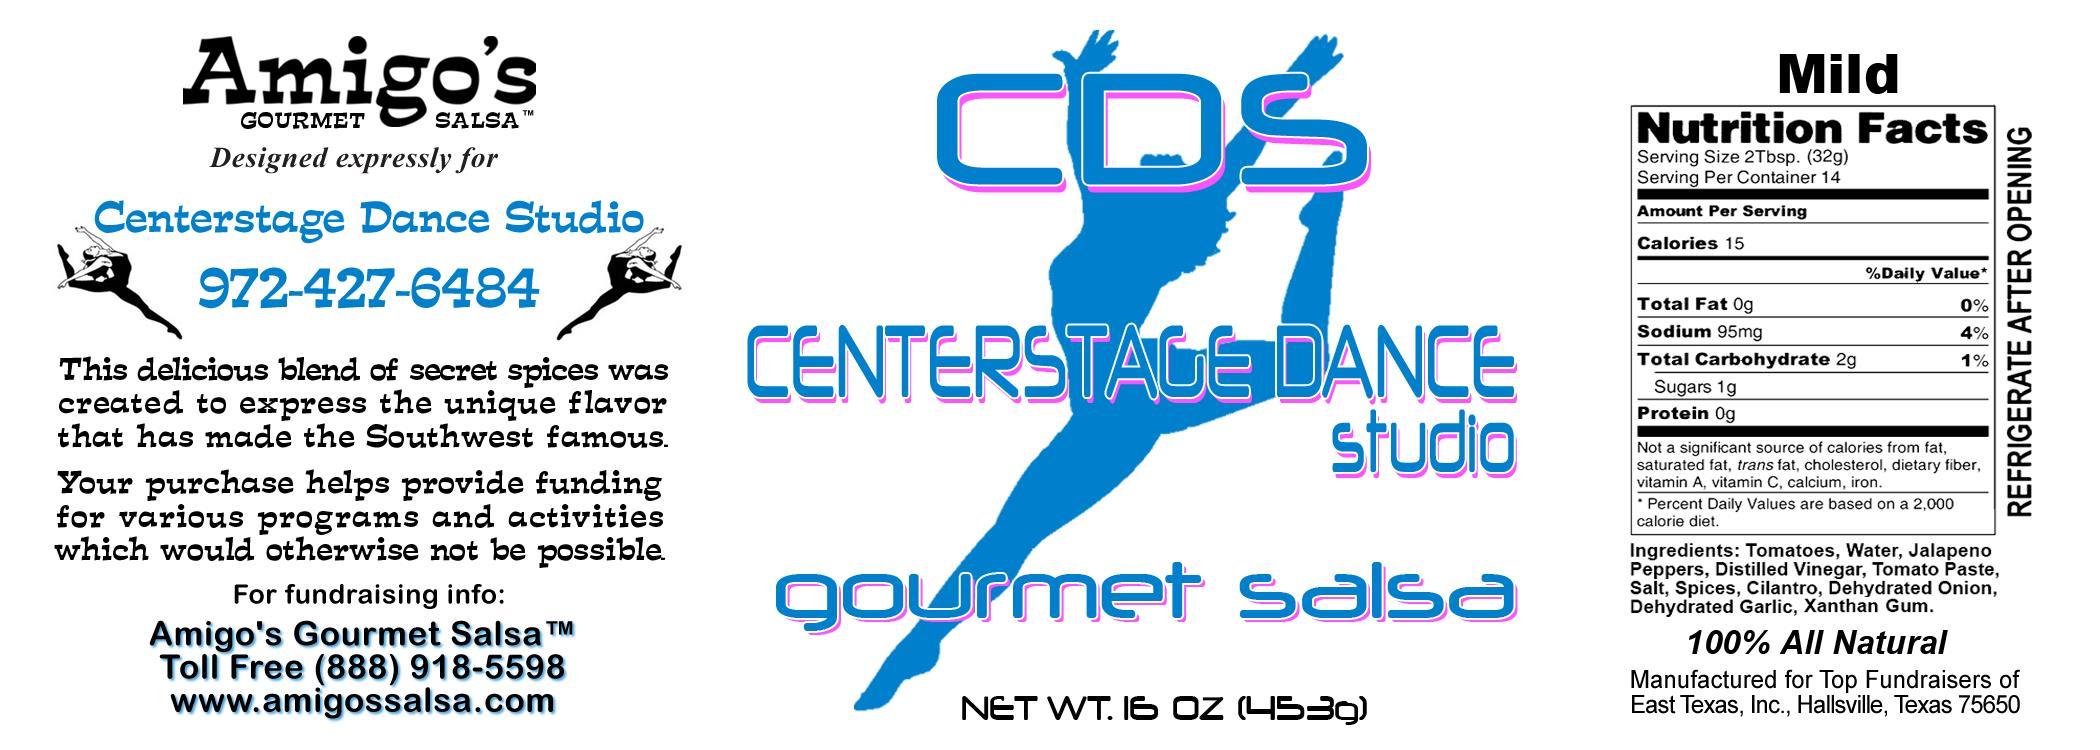 Centerstage Dance Studio Jar Label MILD.jpg